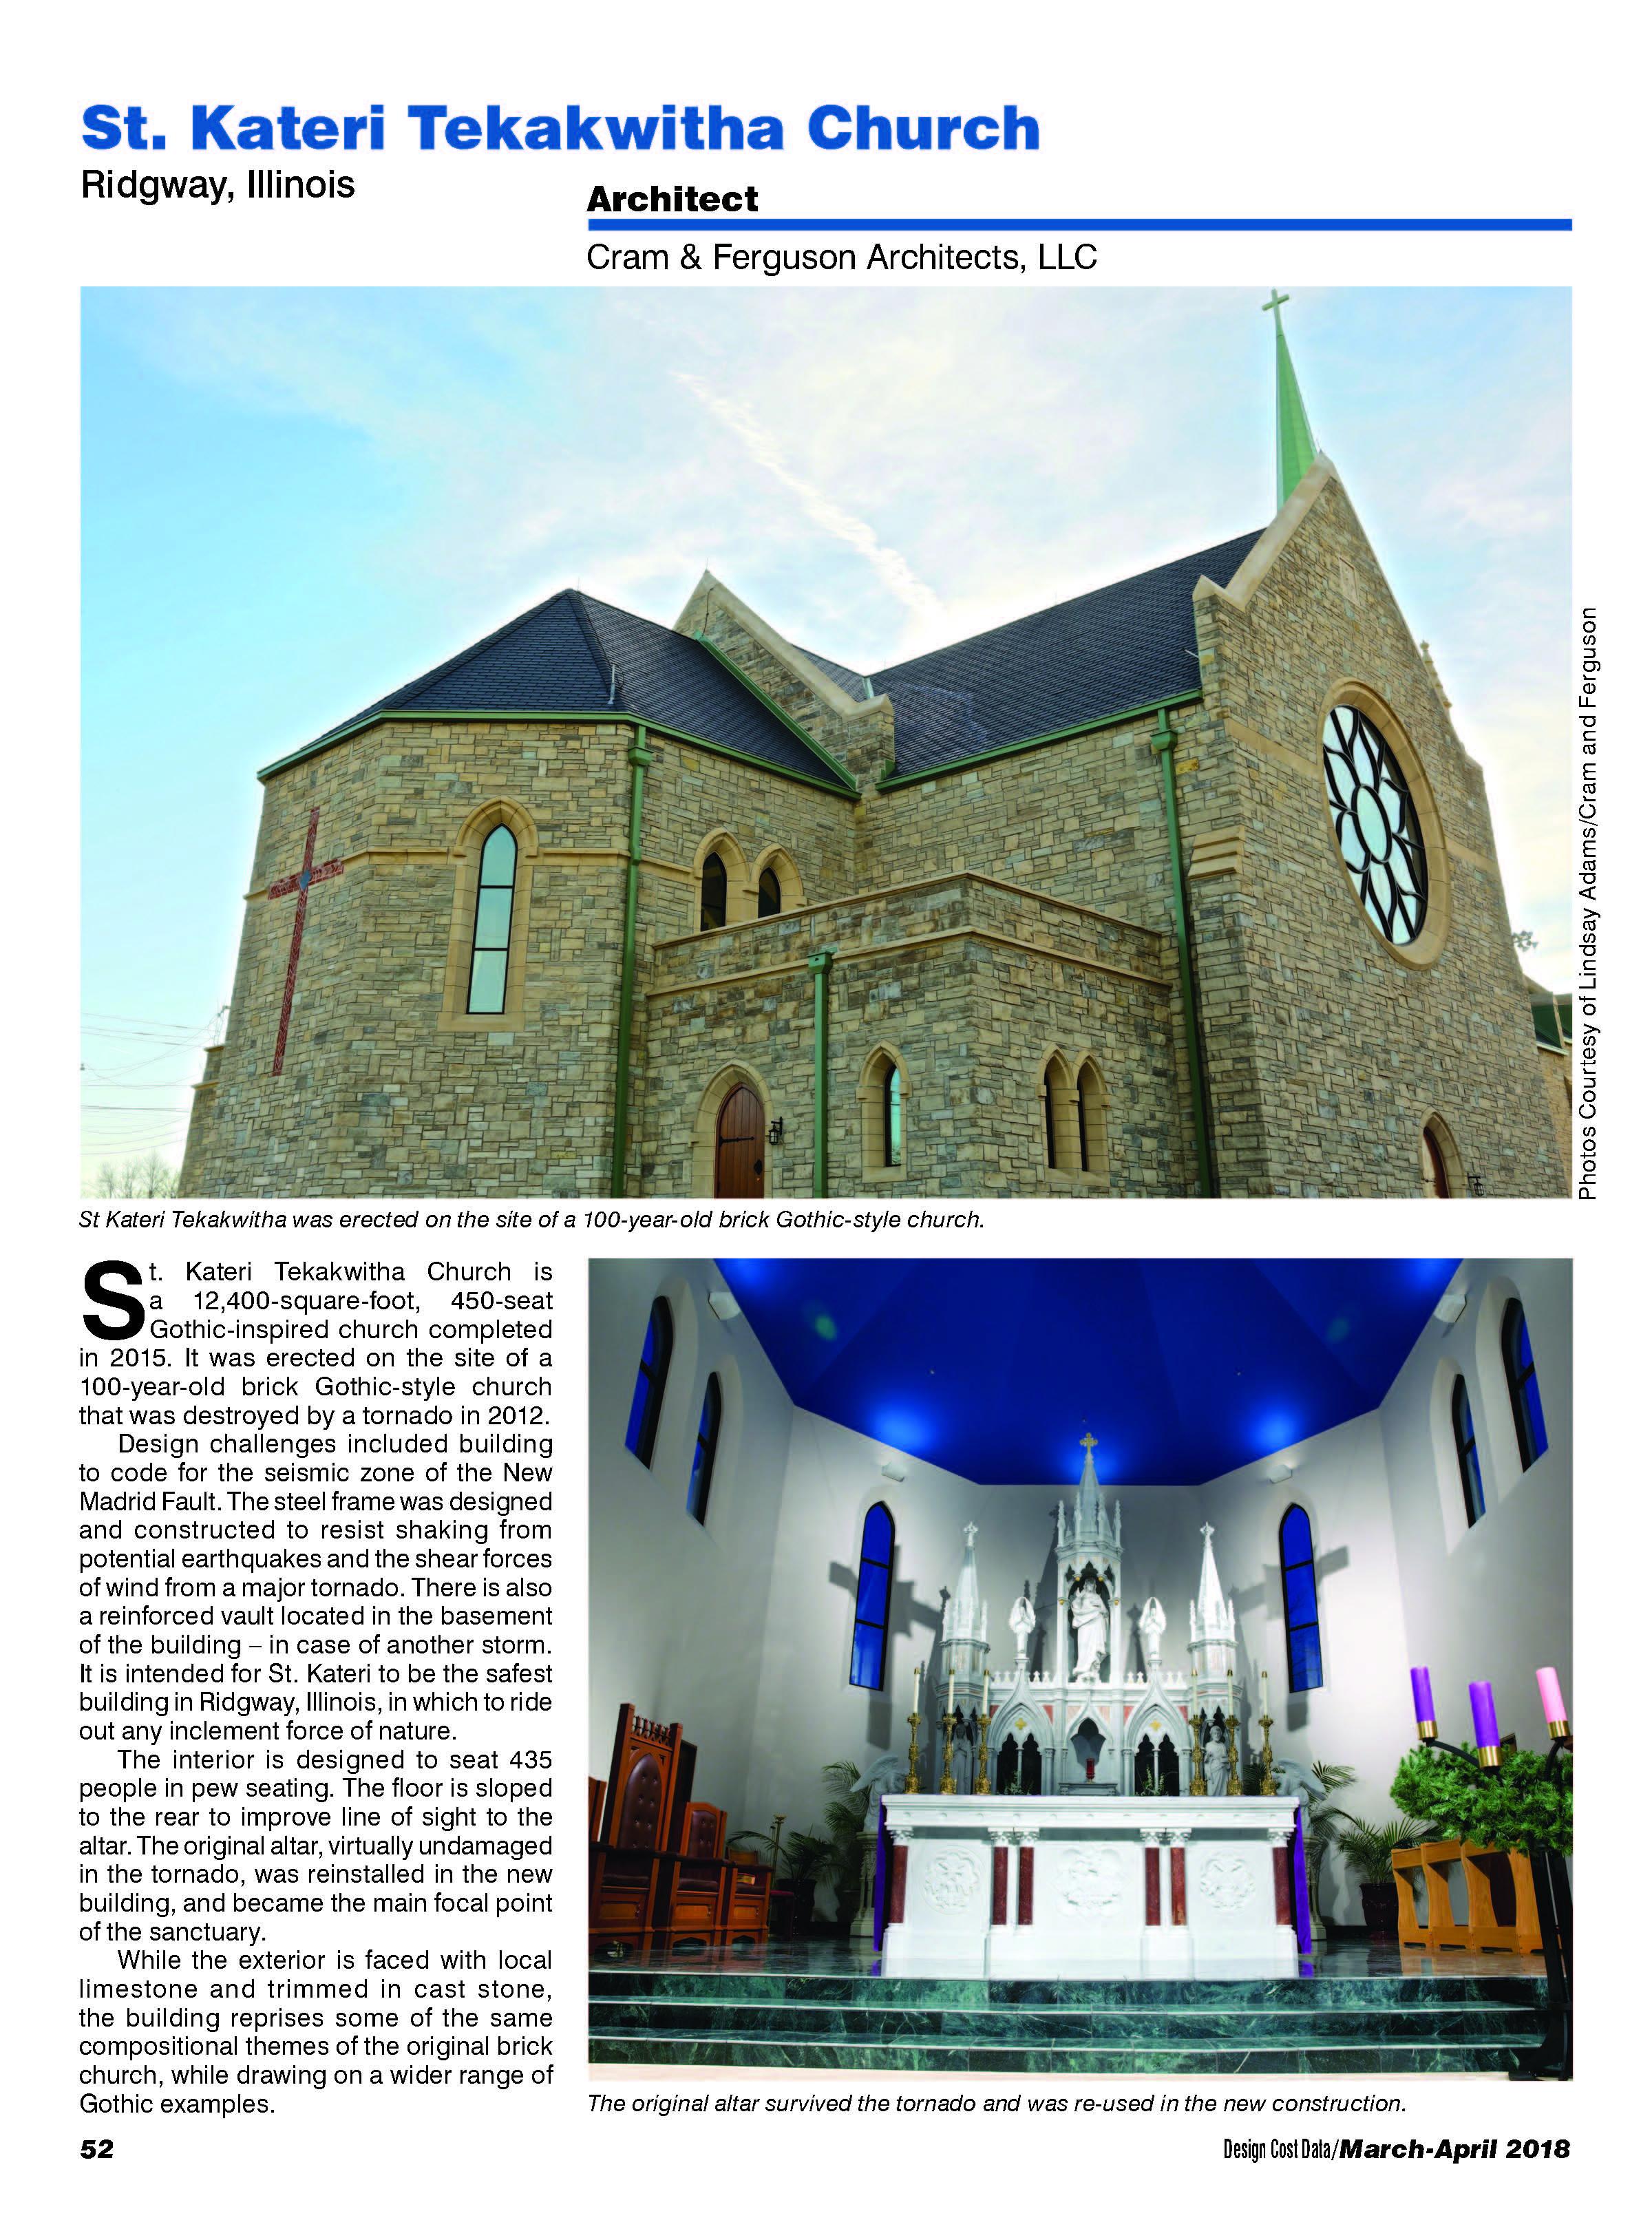 52-54_r1-St Kateri Tekakwitha Church_Page_1.jpg